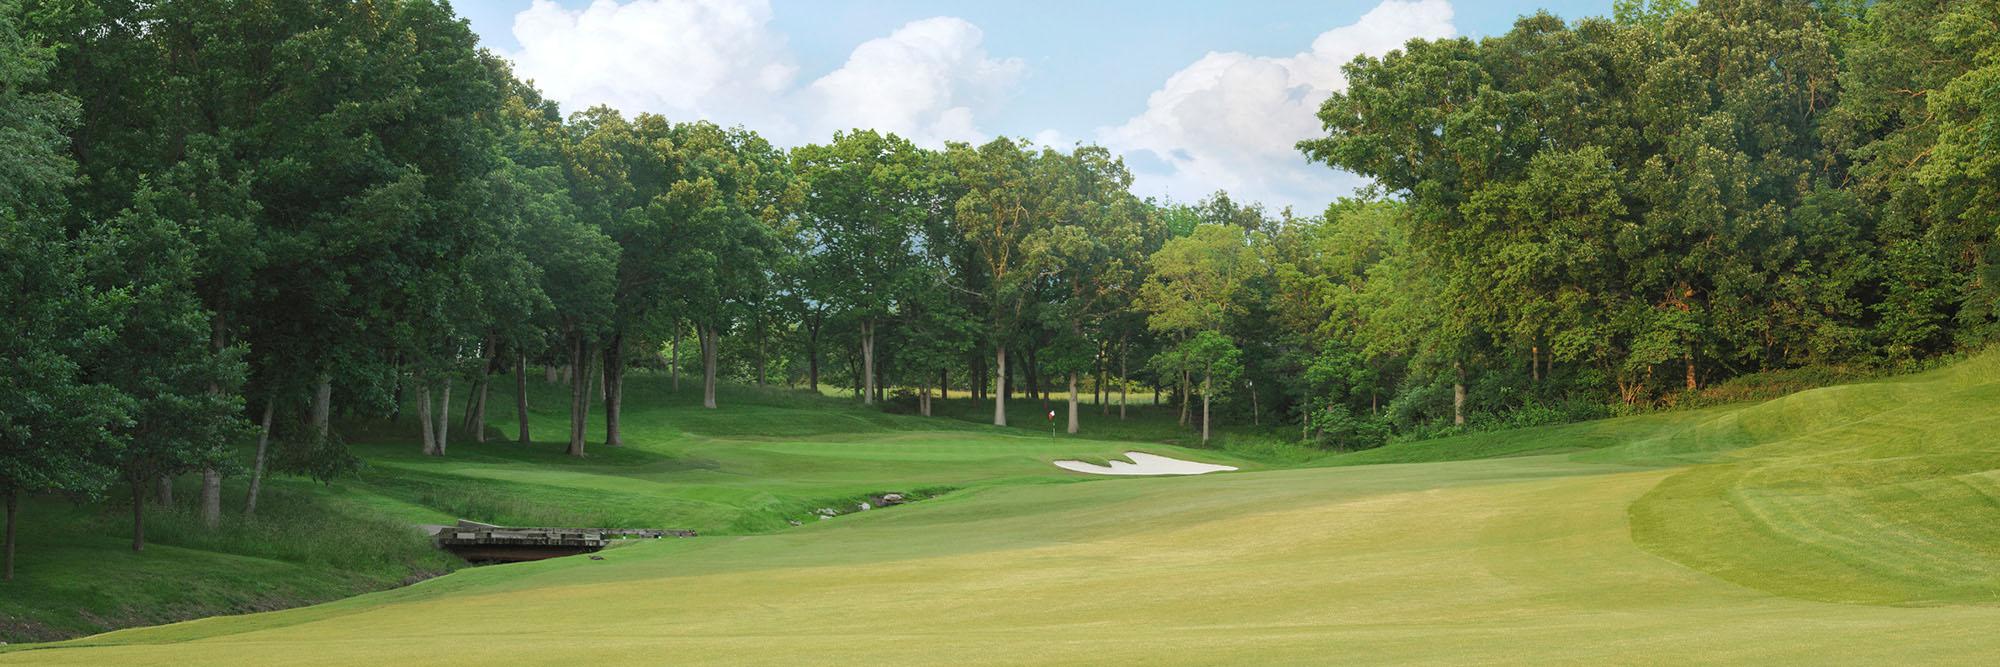 Golf Course Image - Hallbrook No. 7